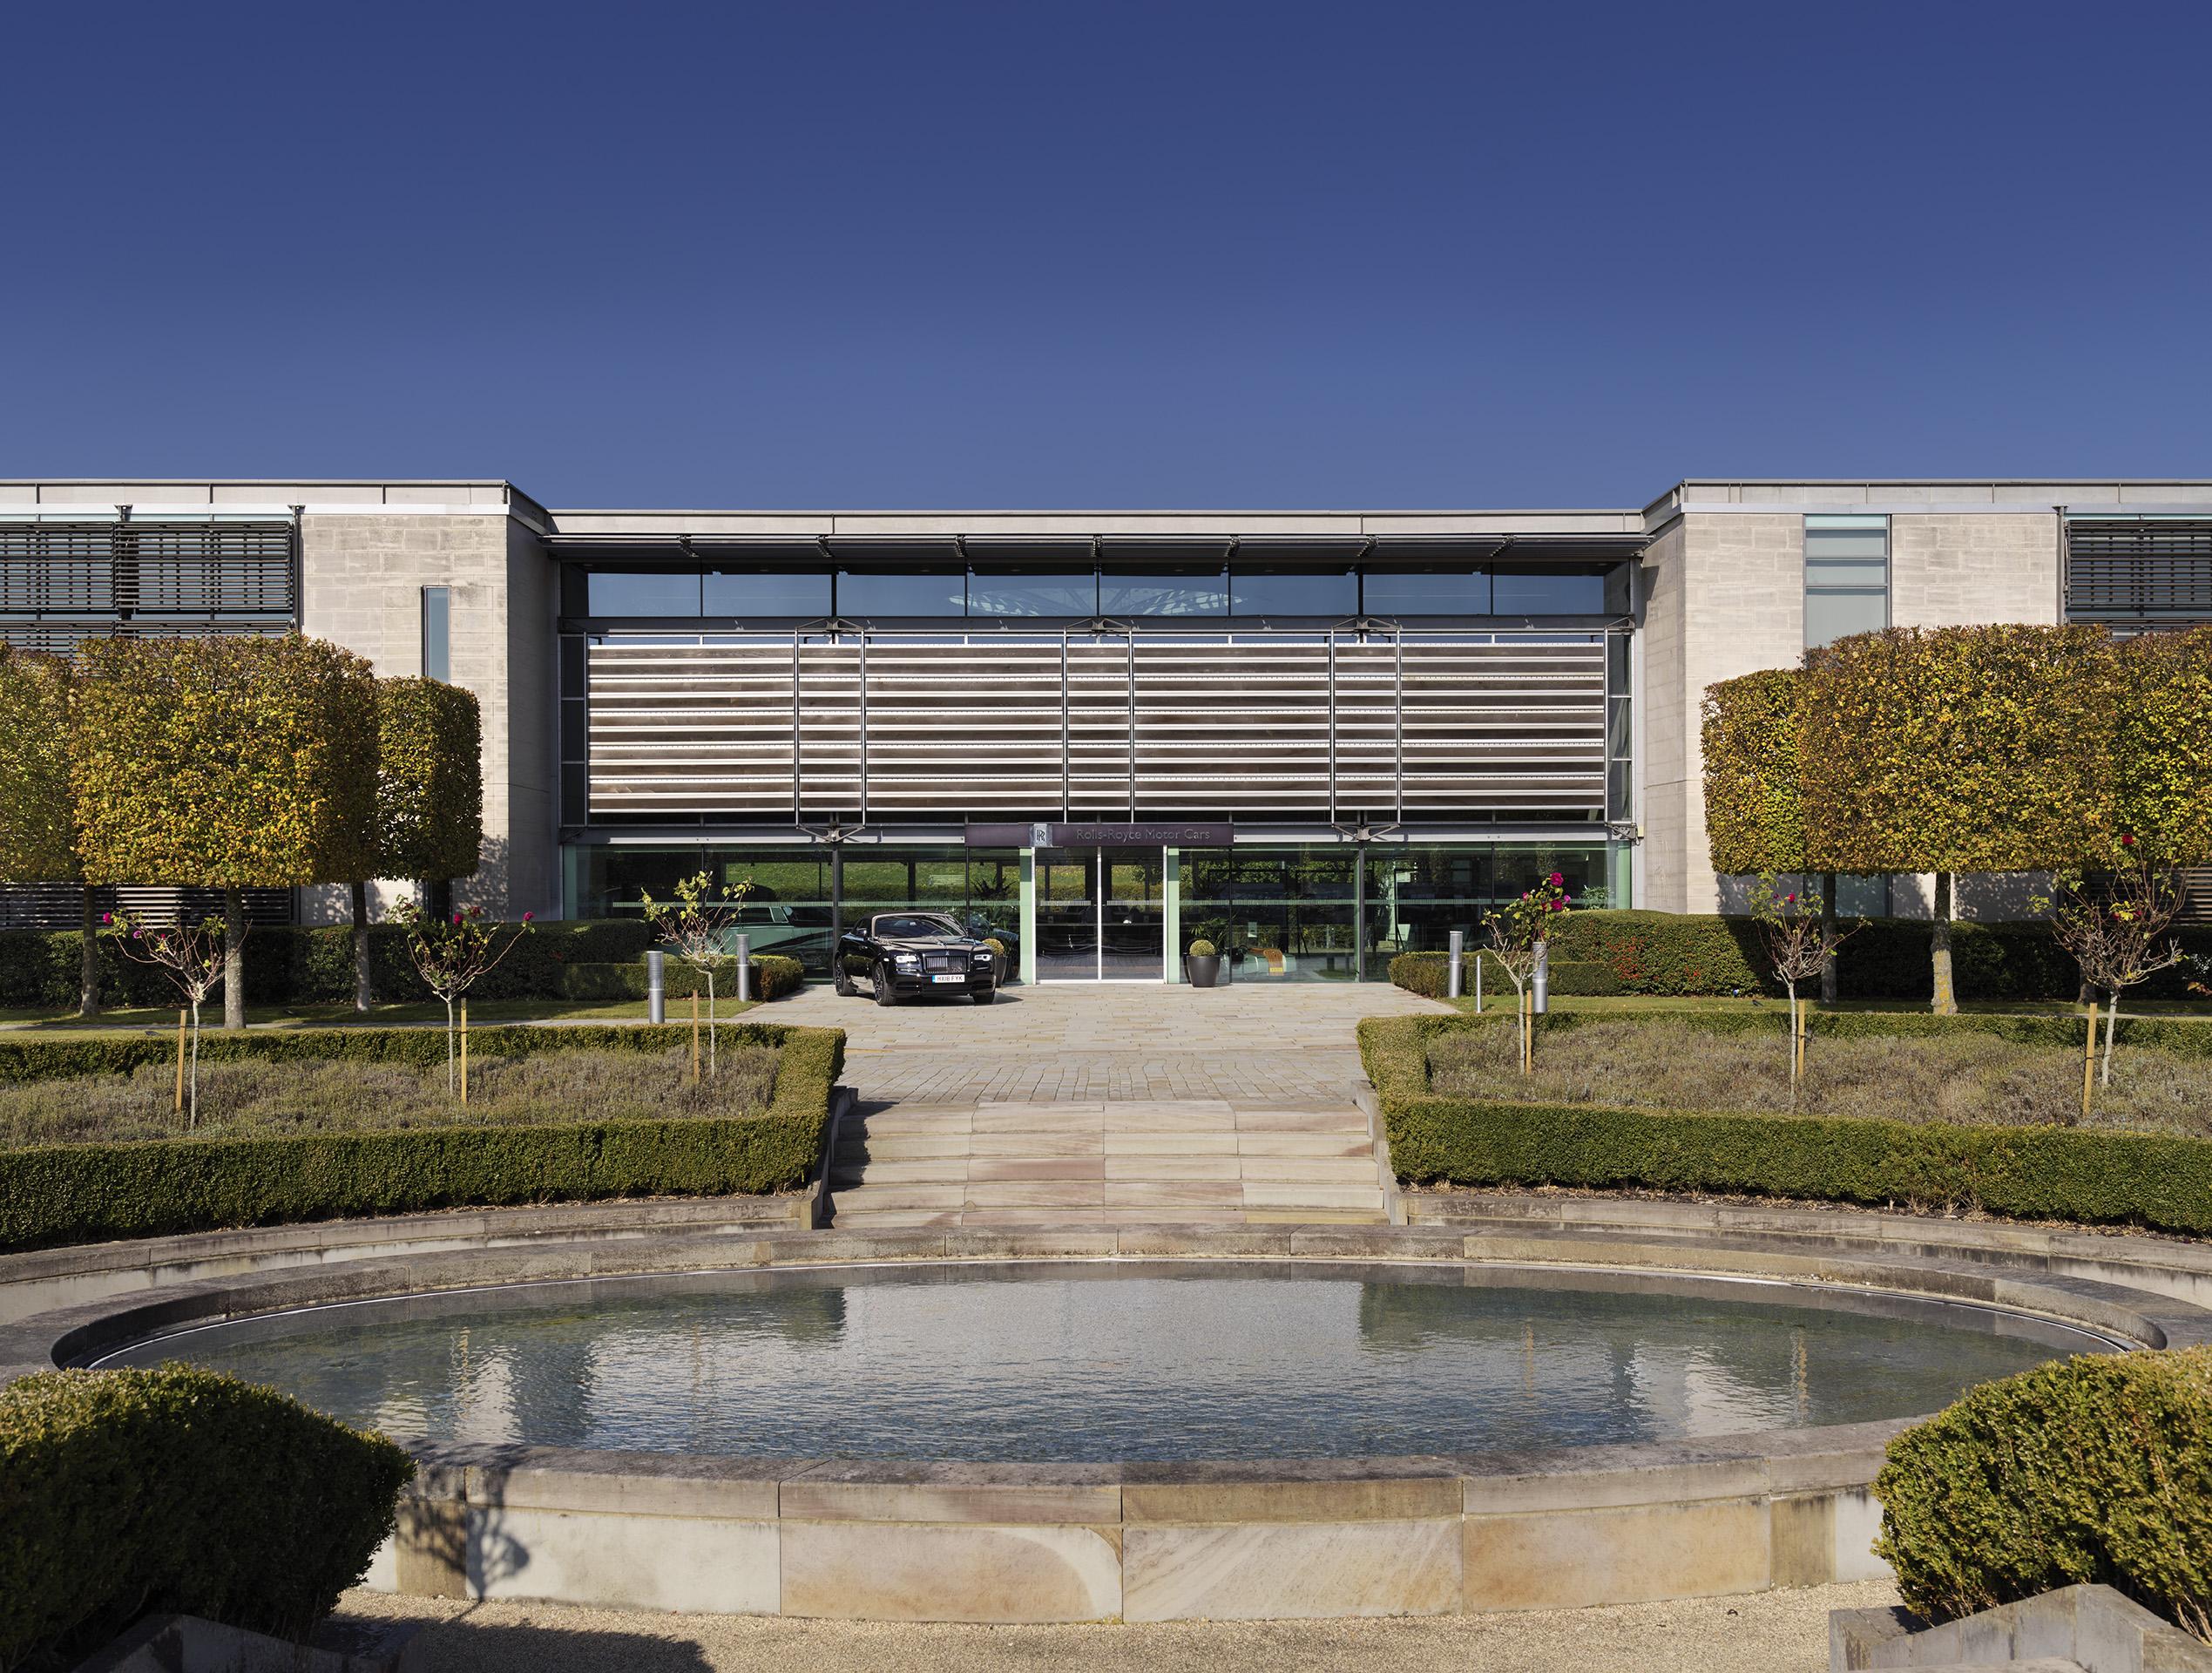 Westhampnett, Rolls-Royce headquarters, by Nicholas Grimshaw & Partners, 2001–3